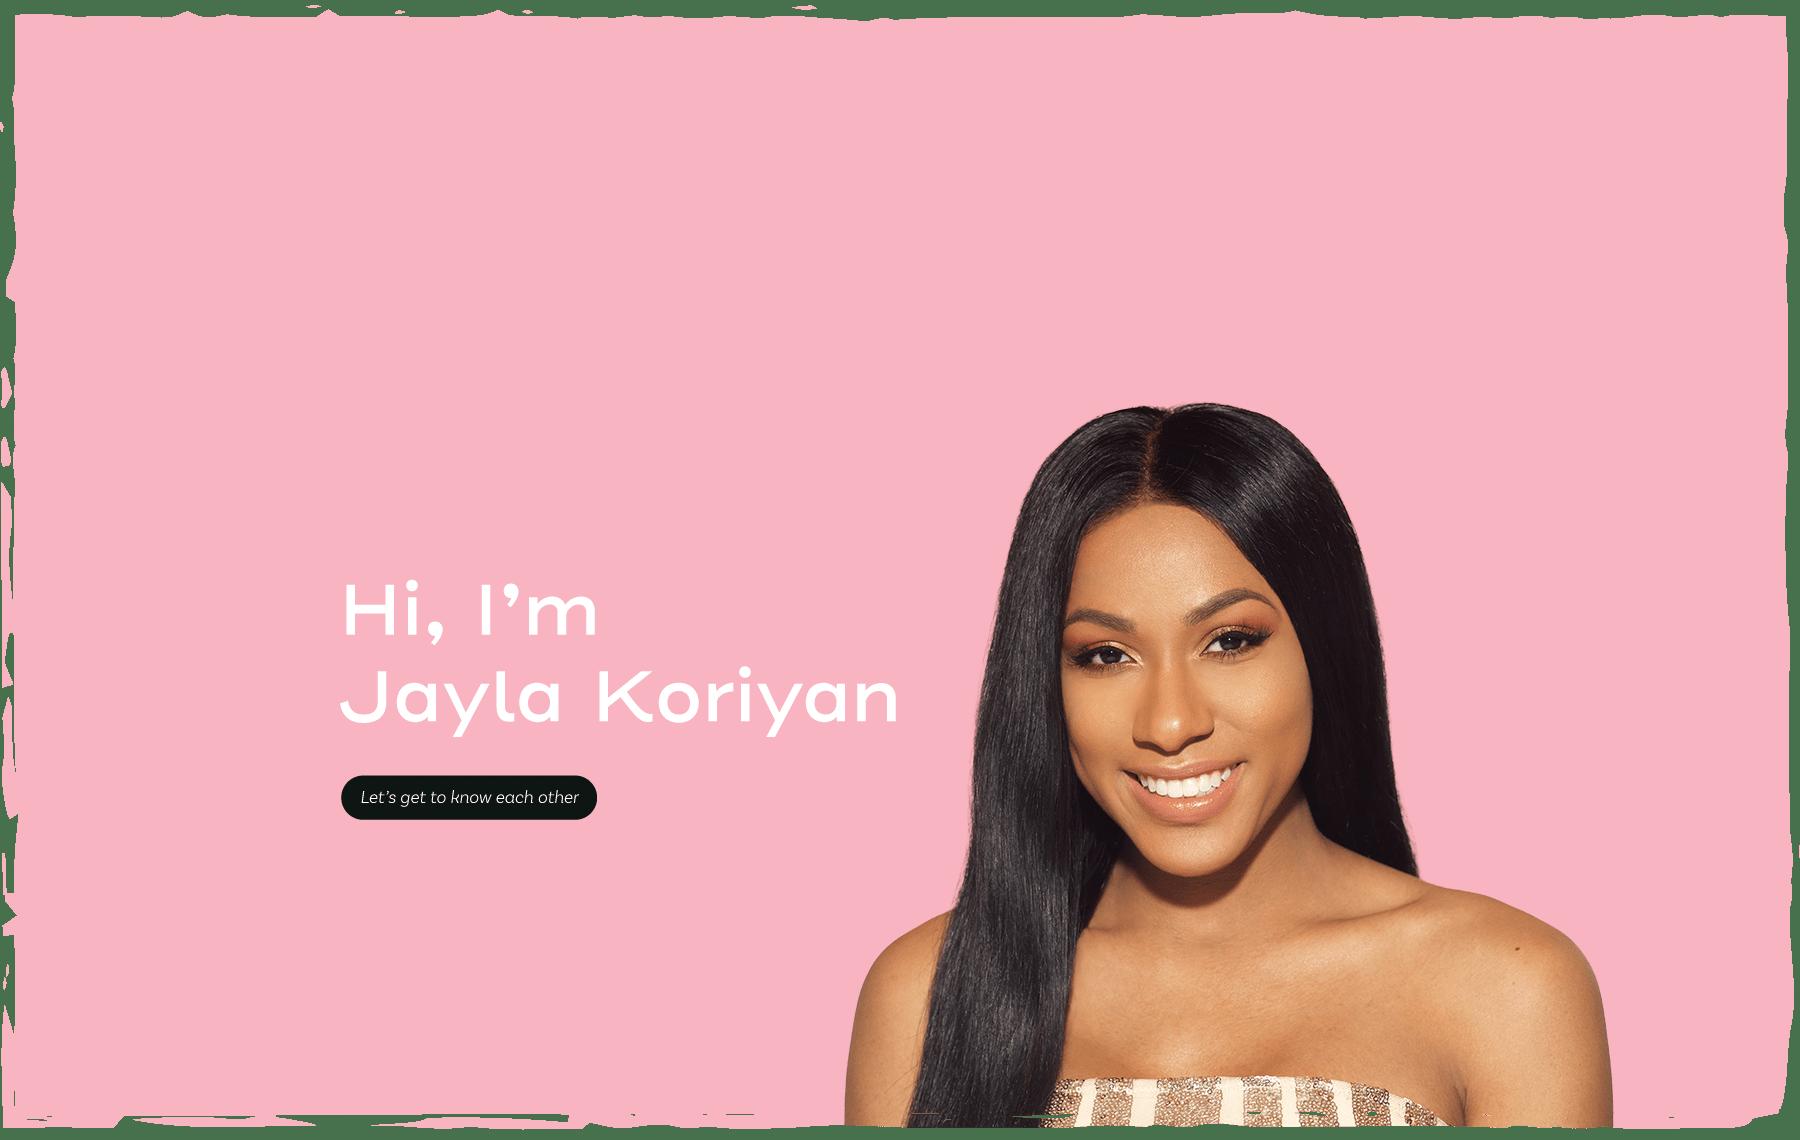 JaylaBanners-texture-01-min.png